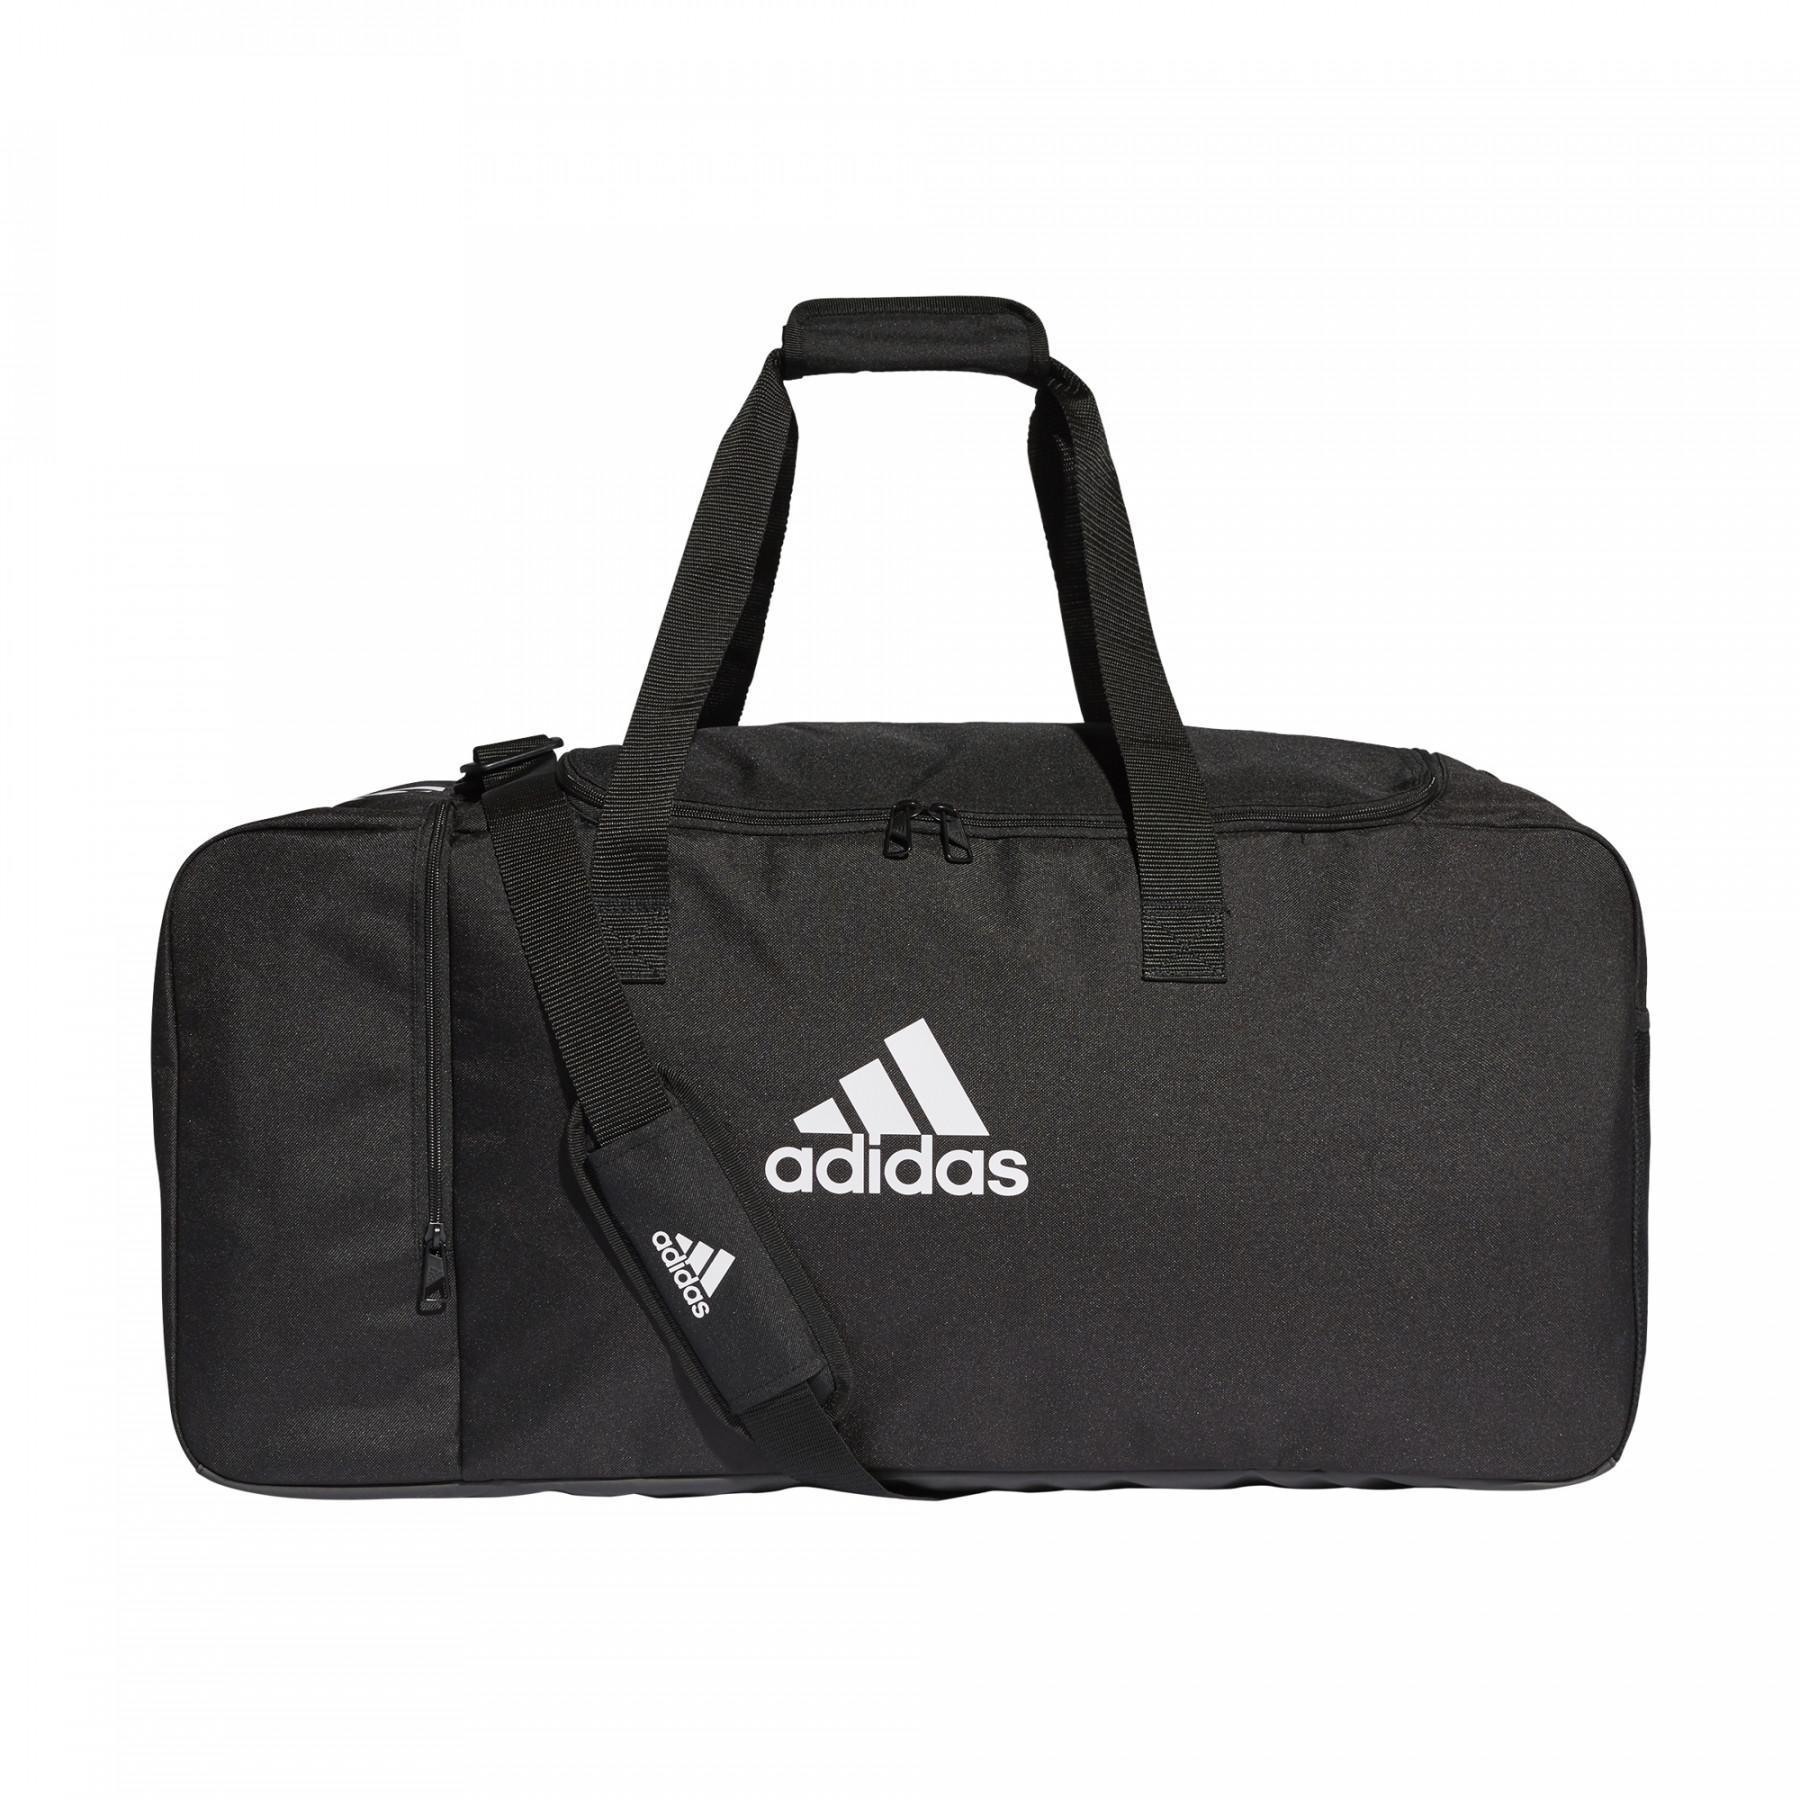 Canvas bag adidas Tiro Grand format